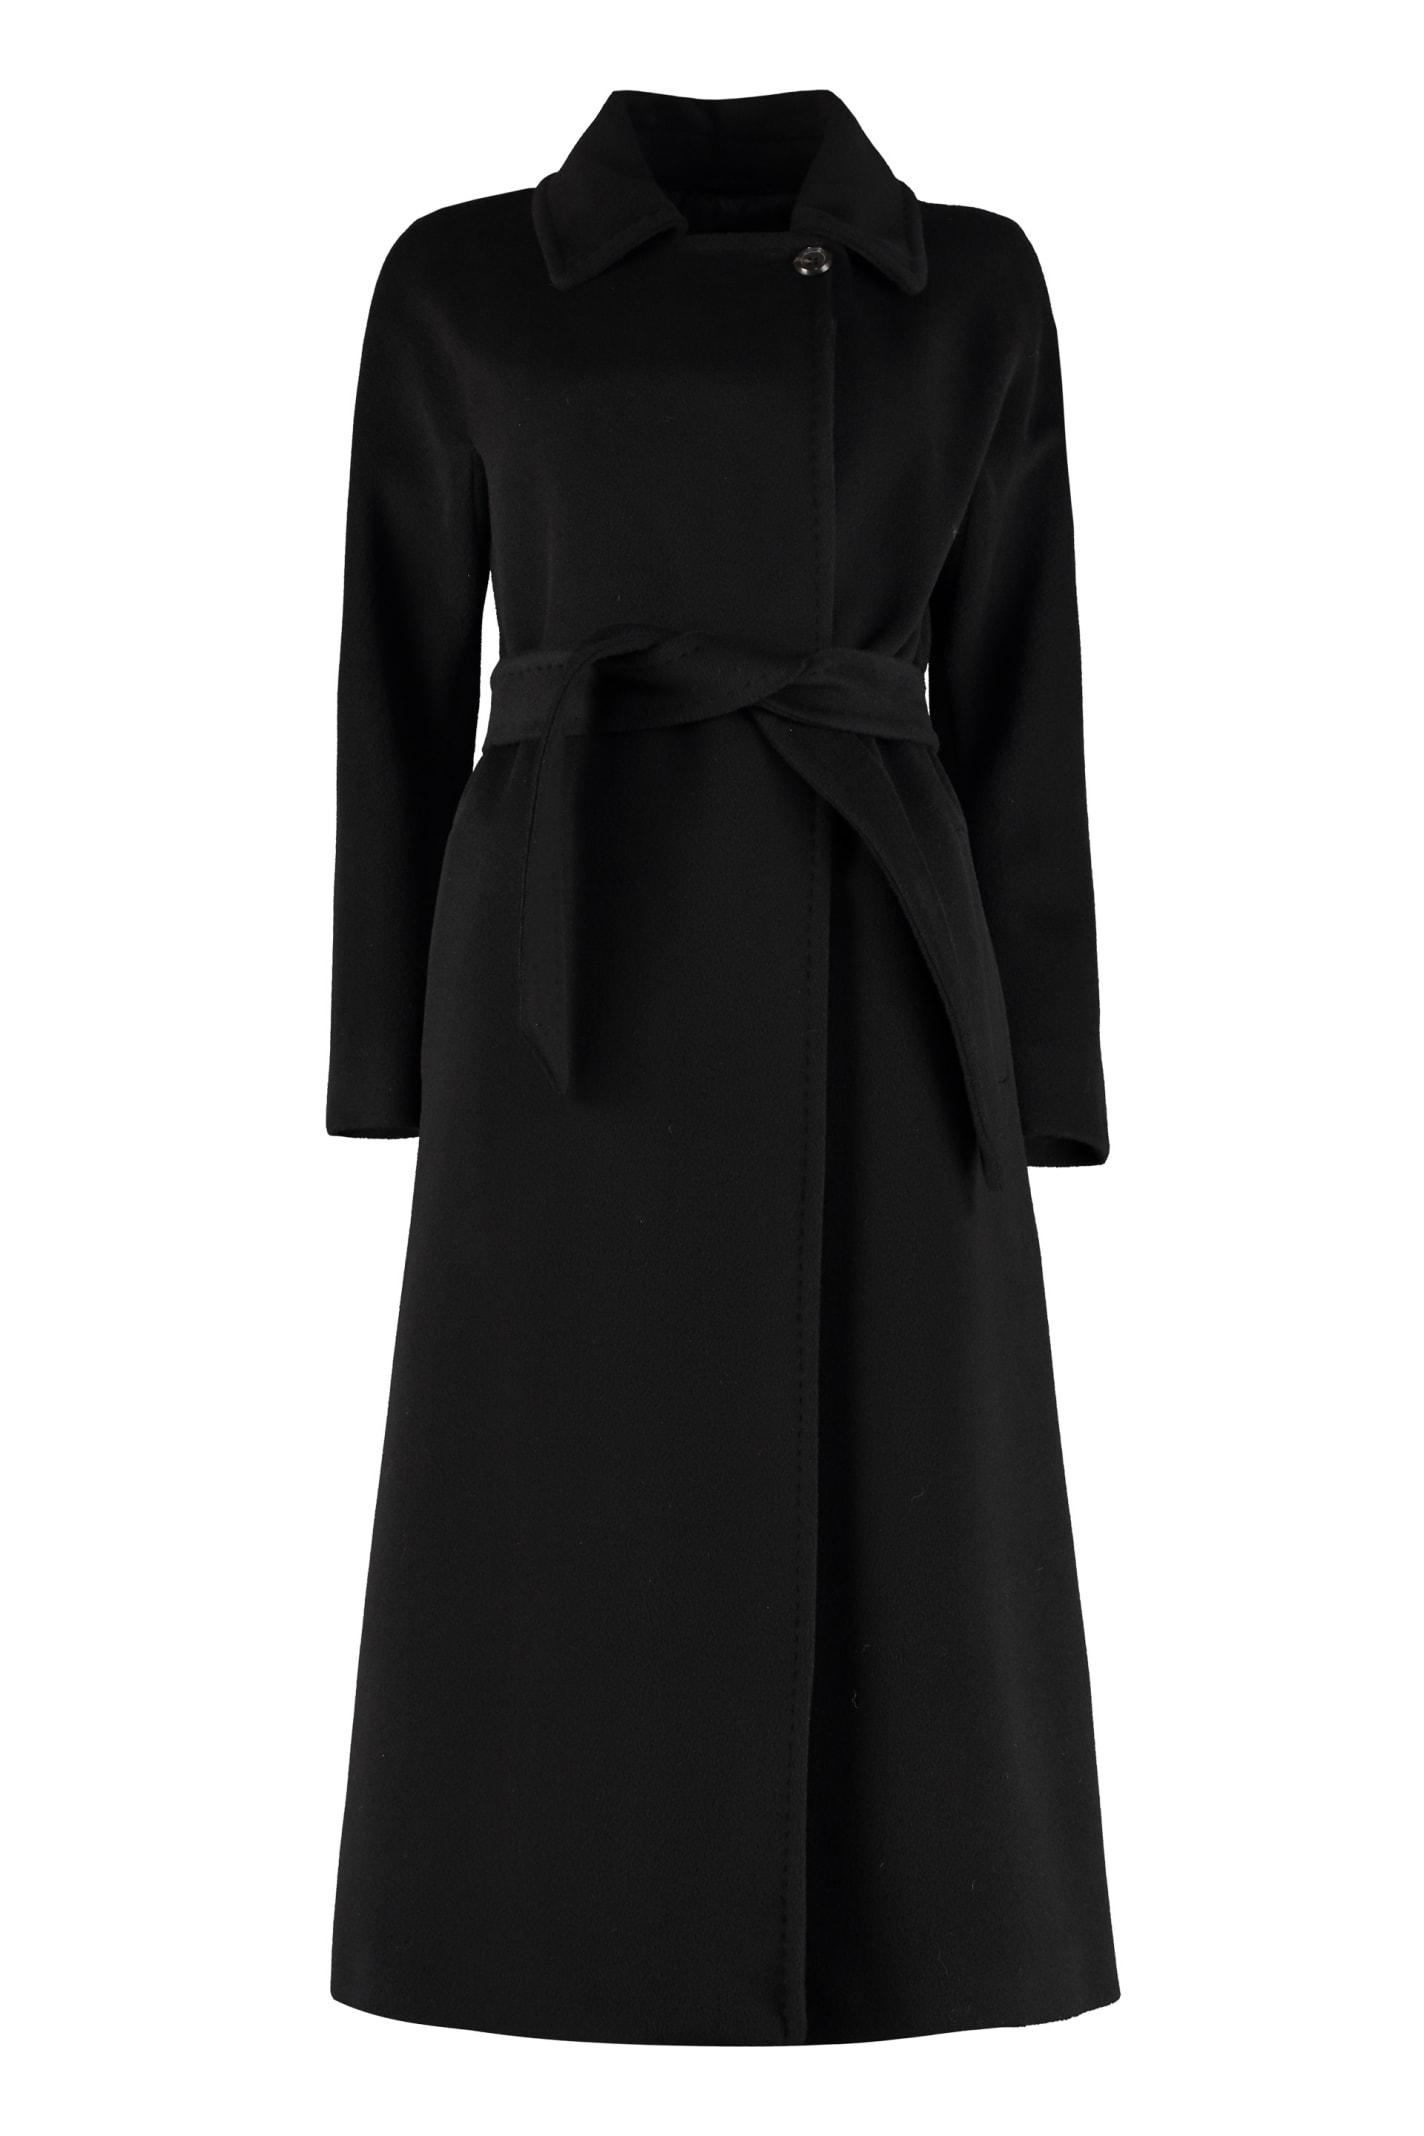 Max Mara Studio Didone Long Wool Coat